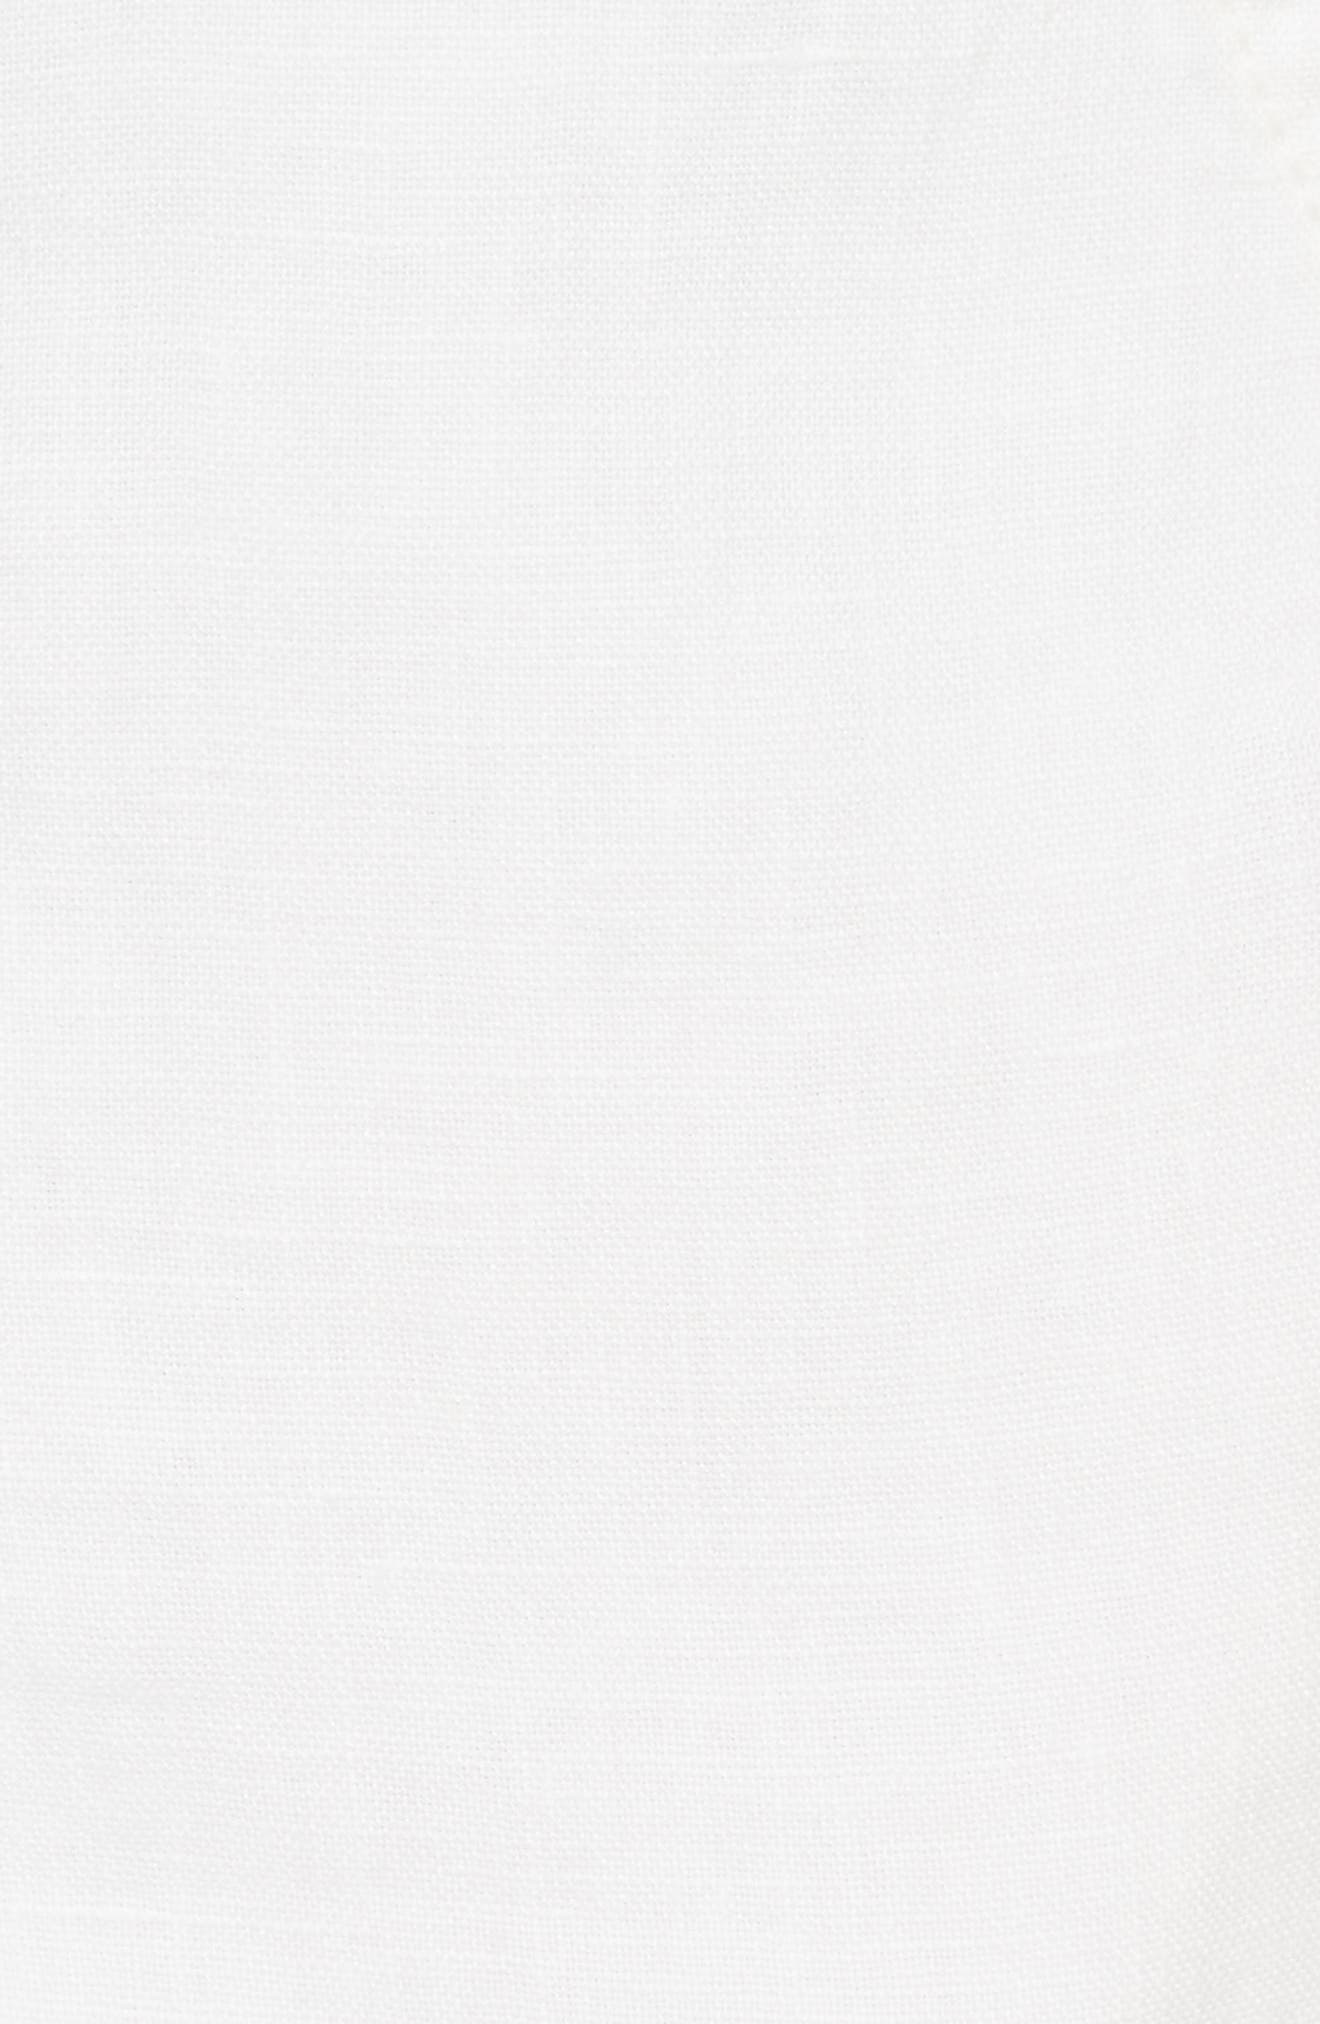 Fosette Linen Drawstring Shorts,                             Alternate thumbnail 5, color,                             Porcelain